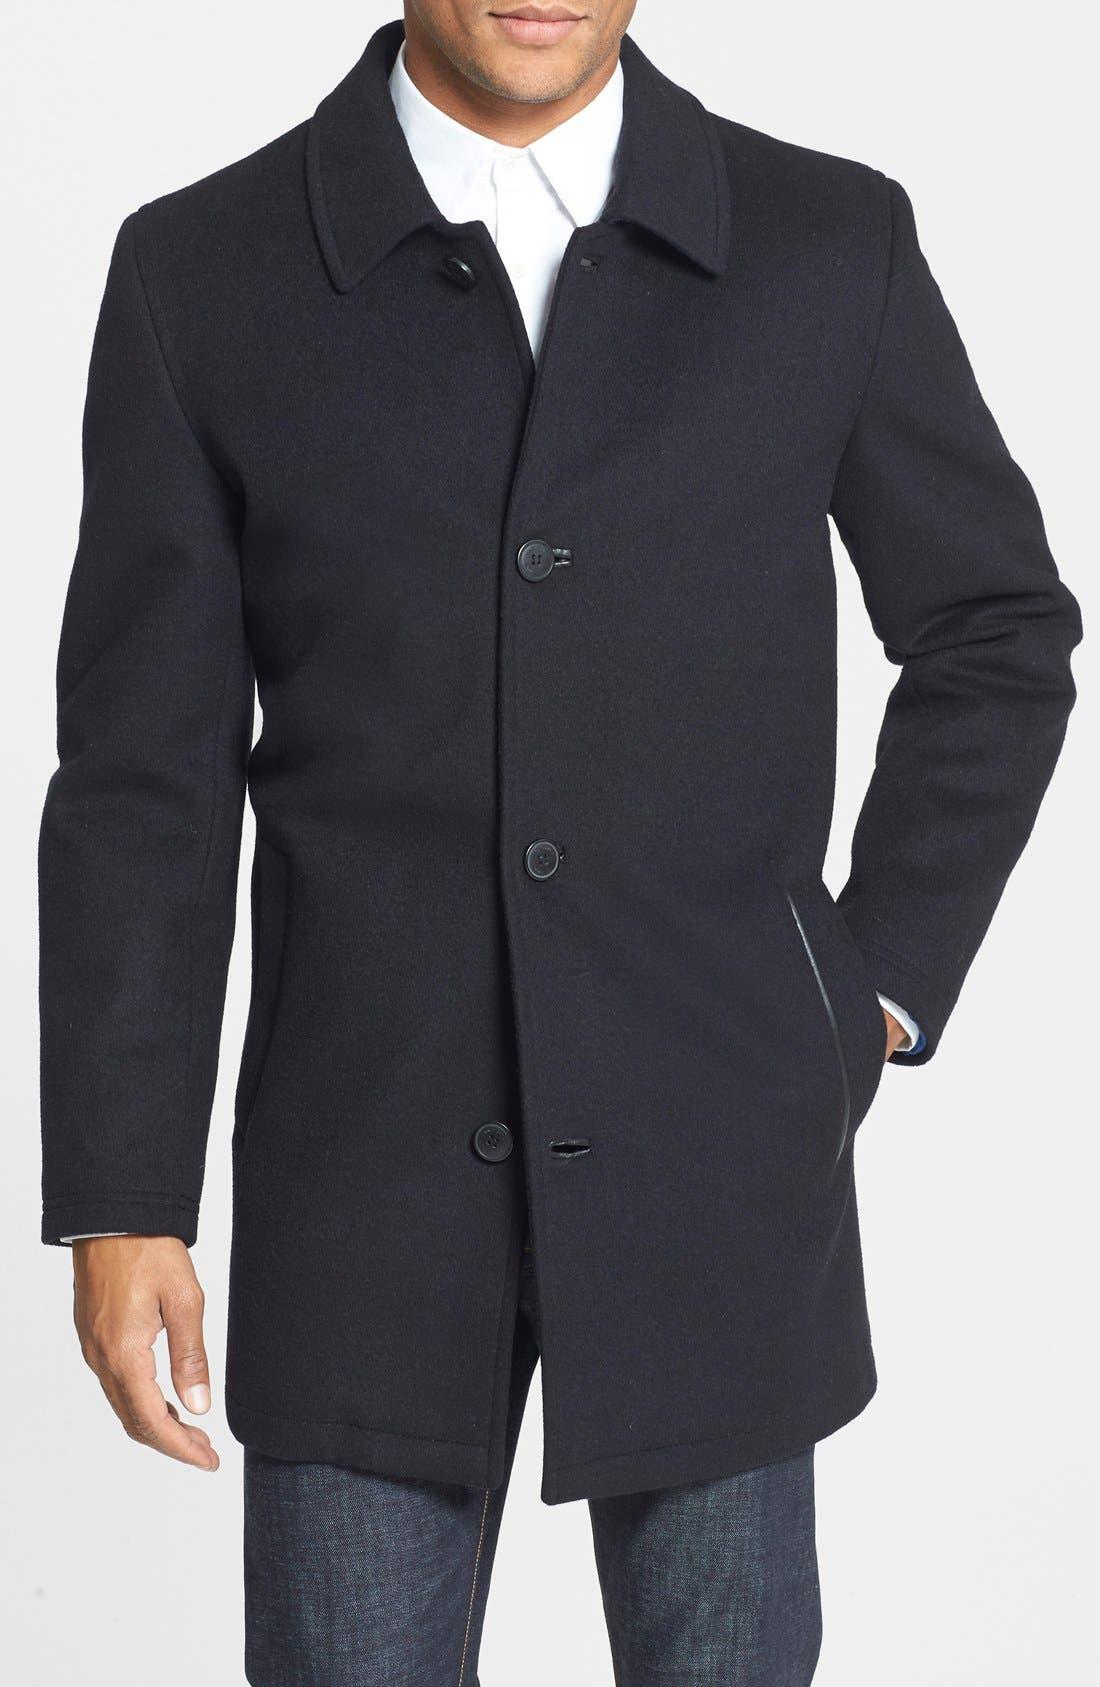 Vince Camuto Water Repellent Wool Blend Car Coat